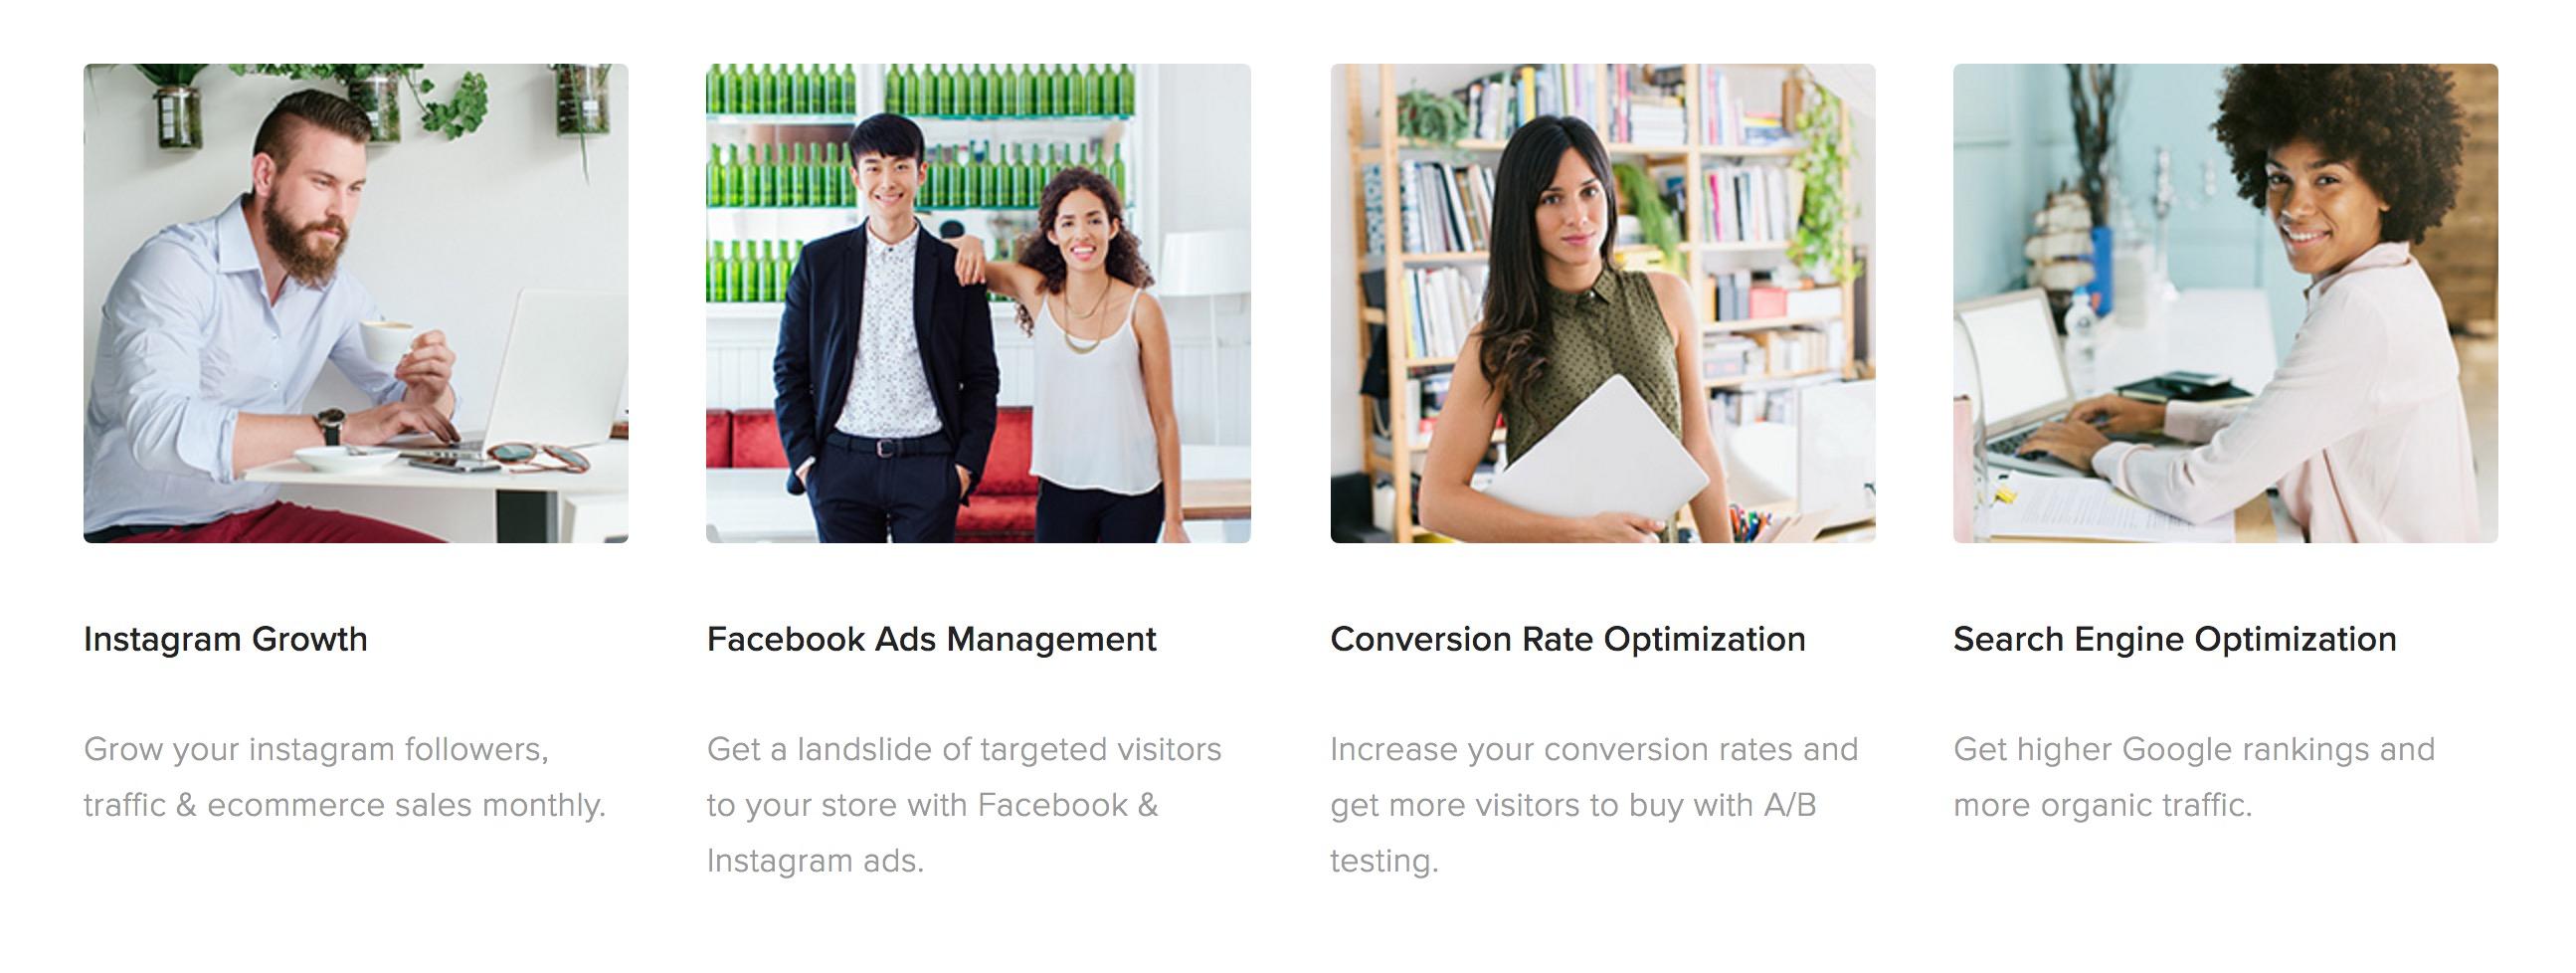 CTA example - conversion centered design